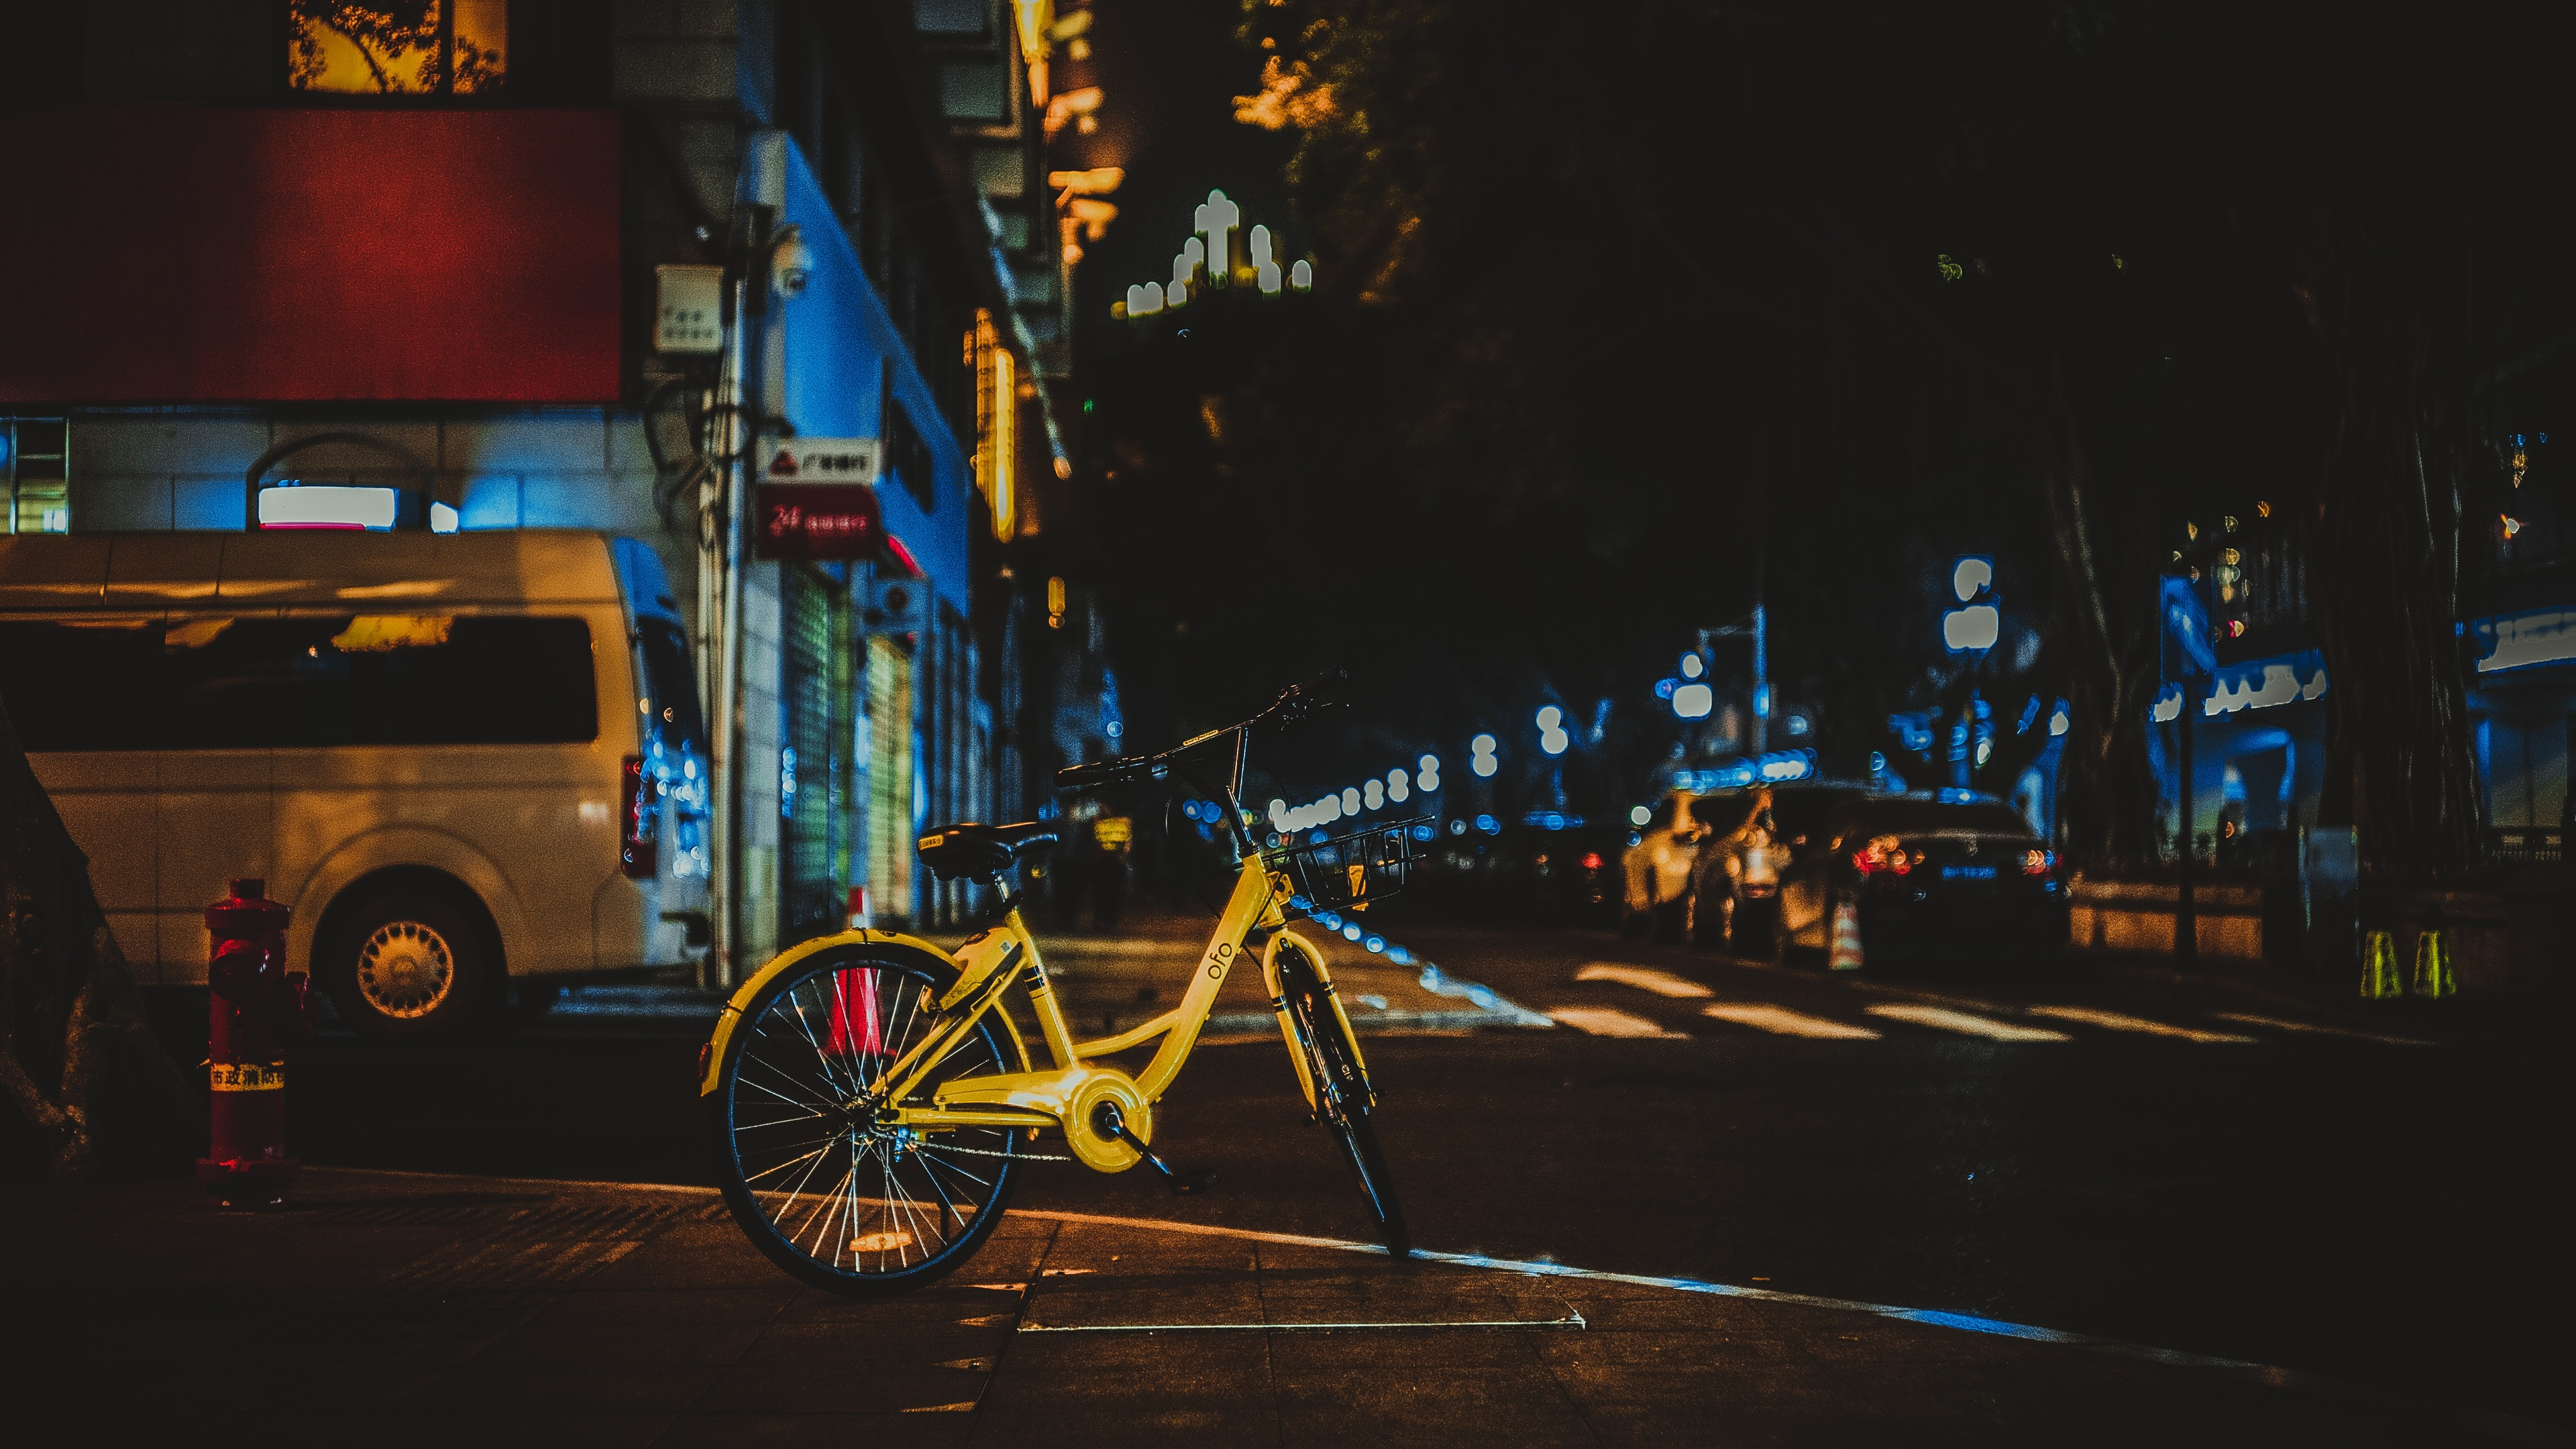 Wallpaper Yellow Bicycle City Night Street 3840x2160 Uhd